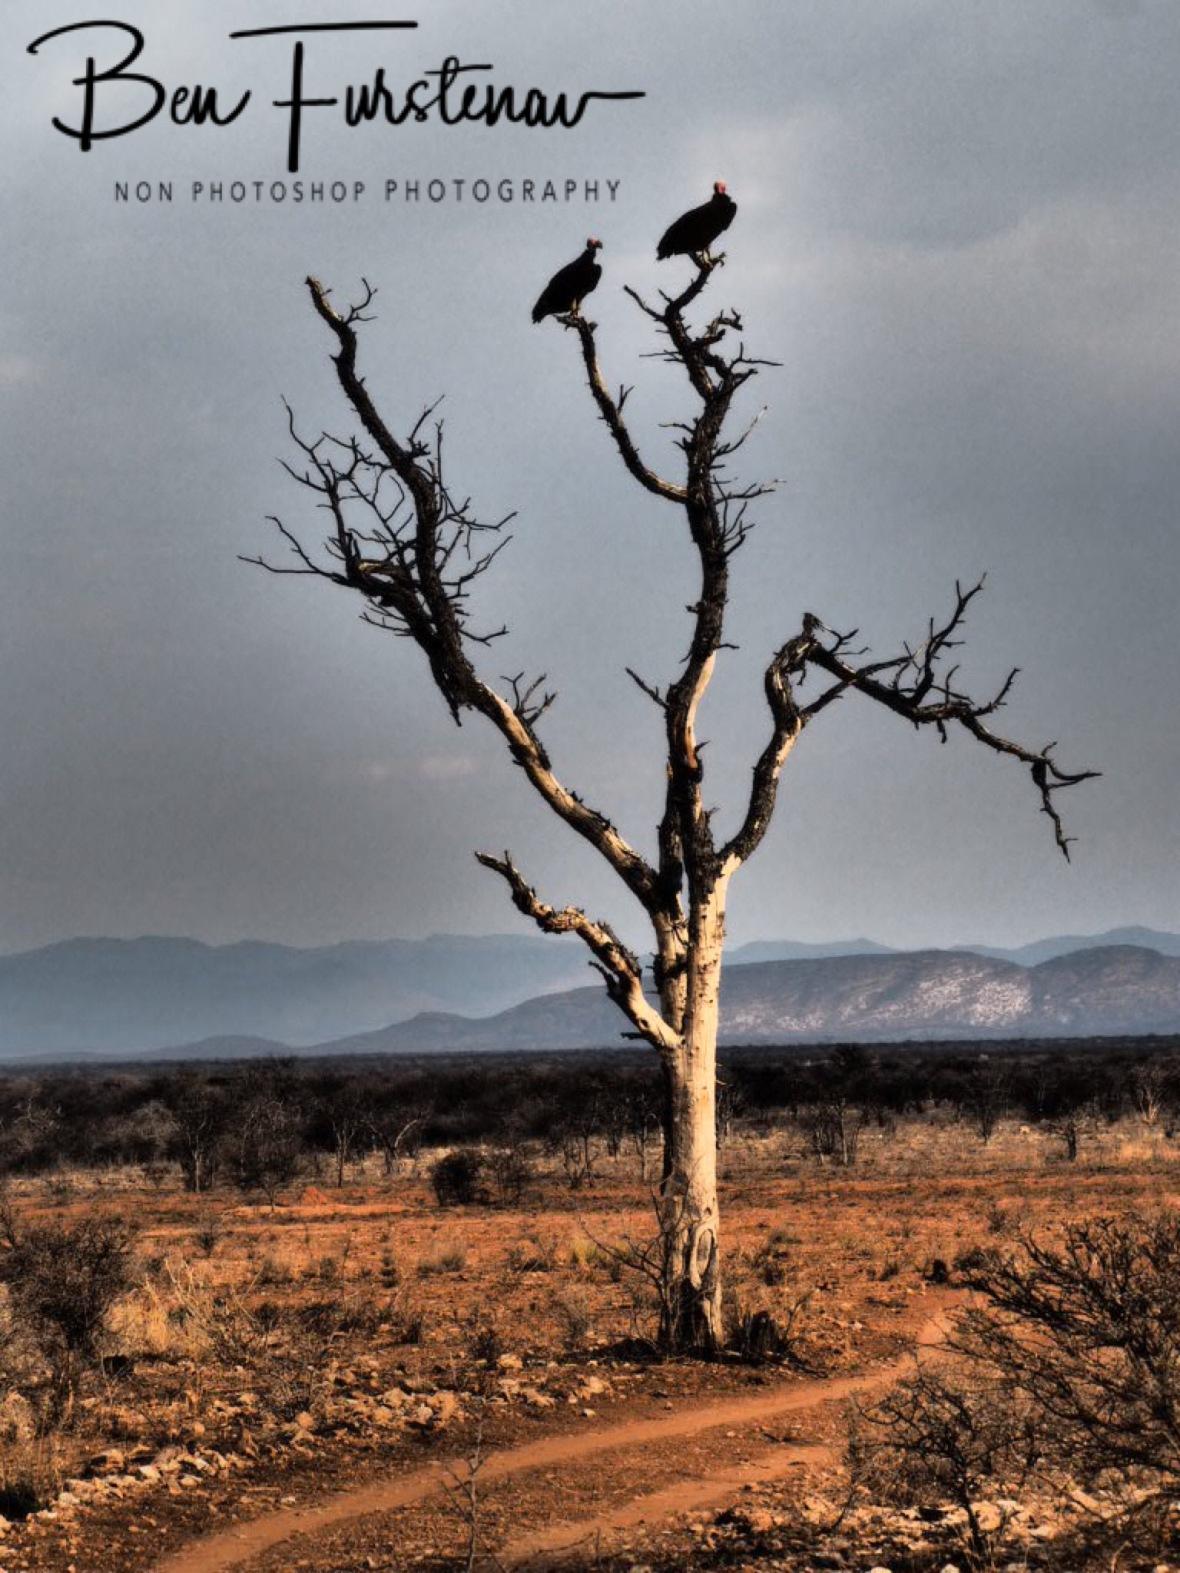 Arid scene, Sophienhof, Outjo, Namibia